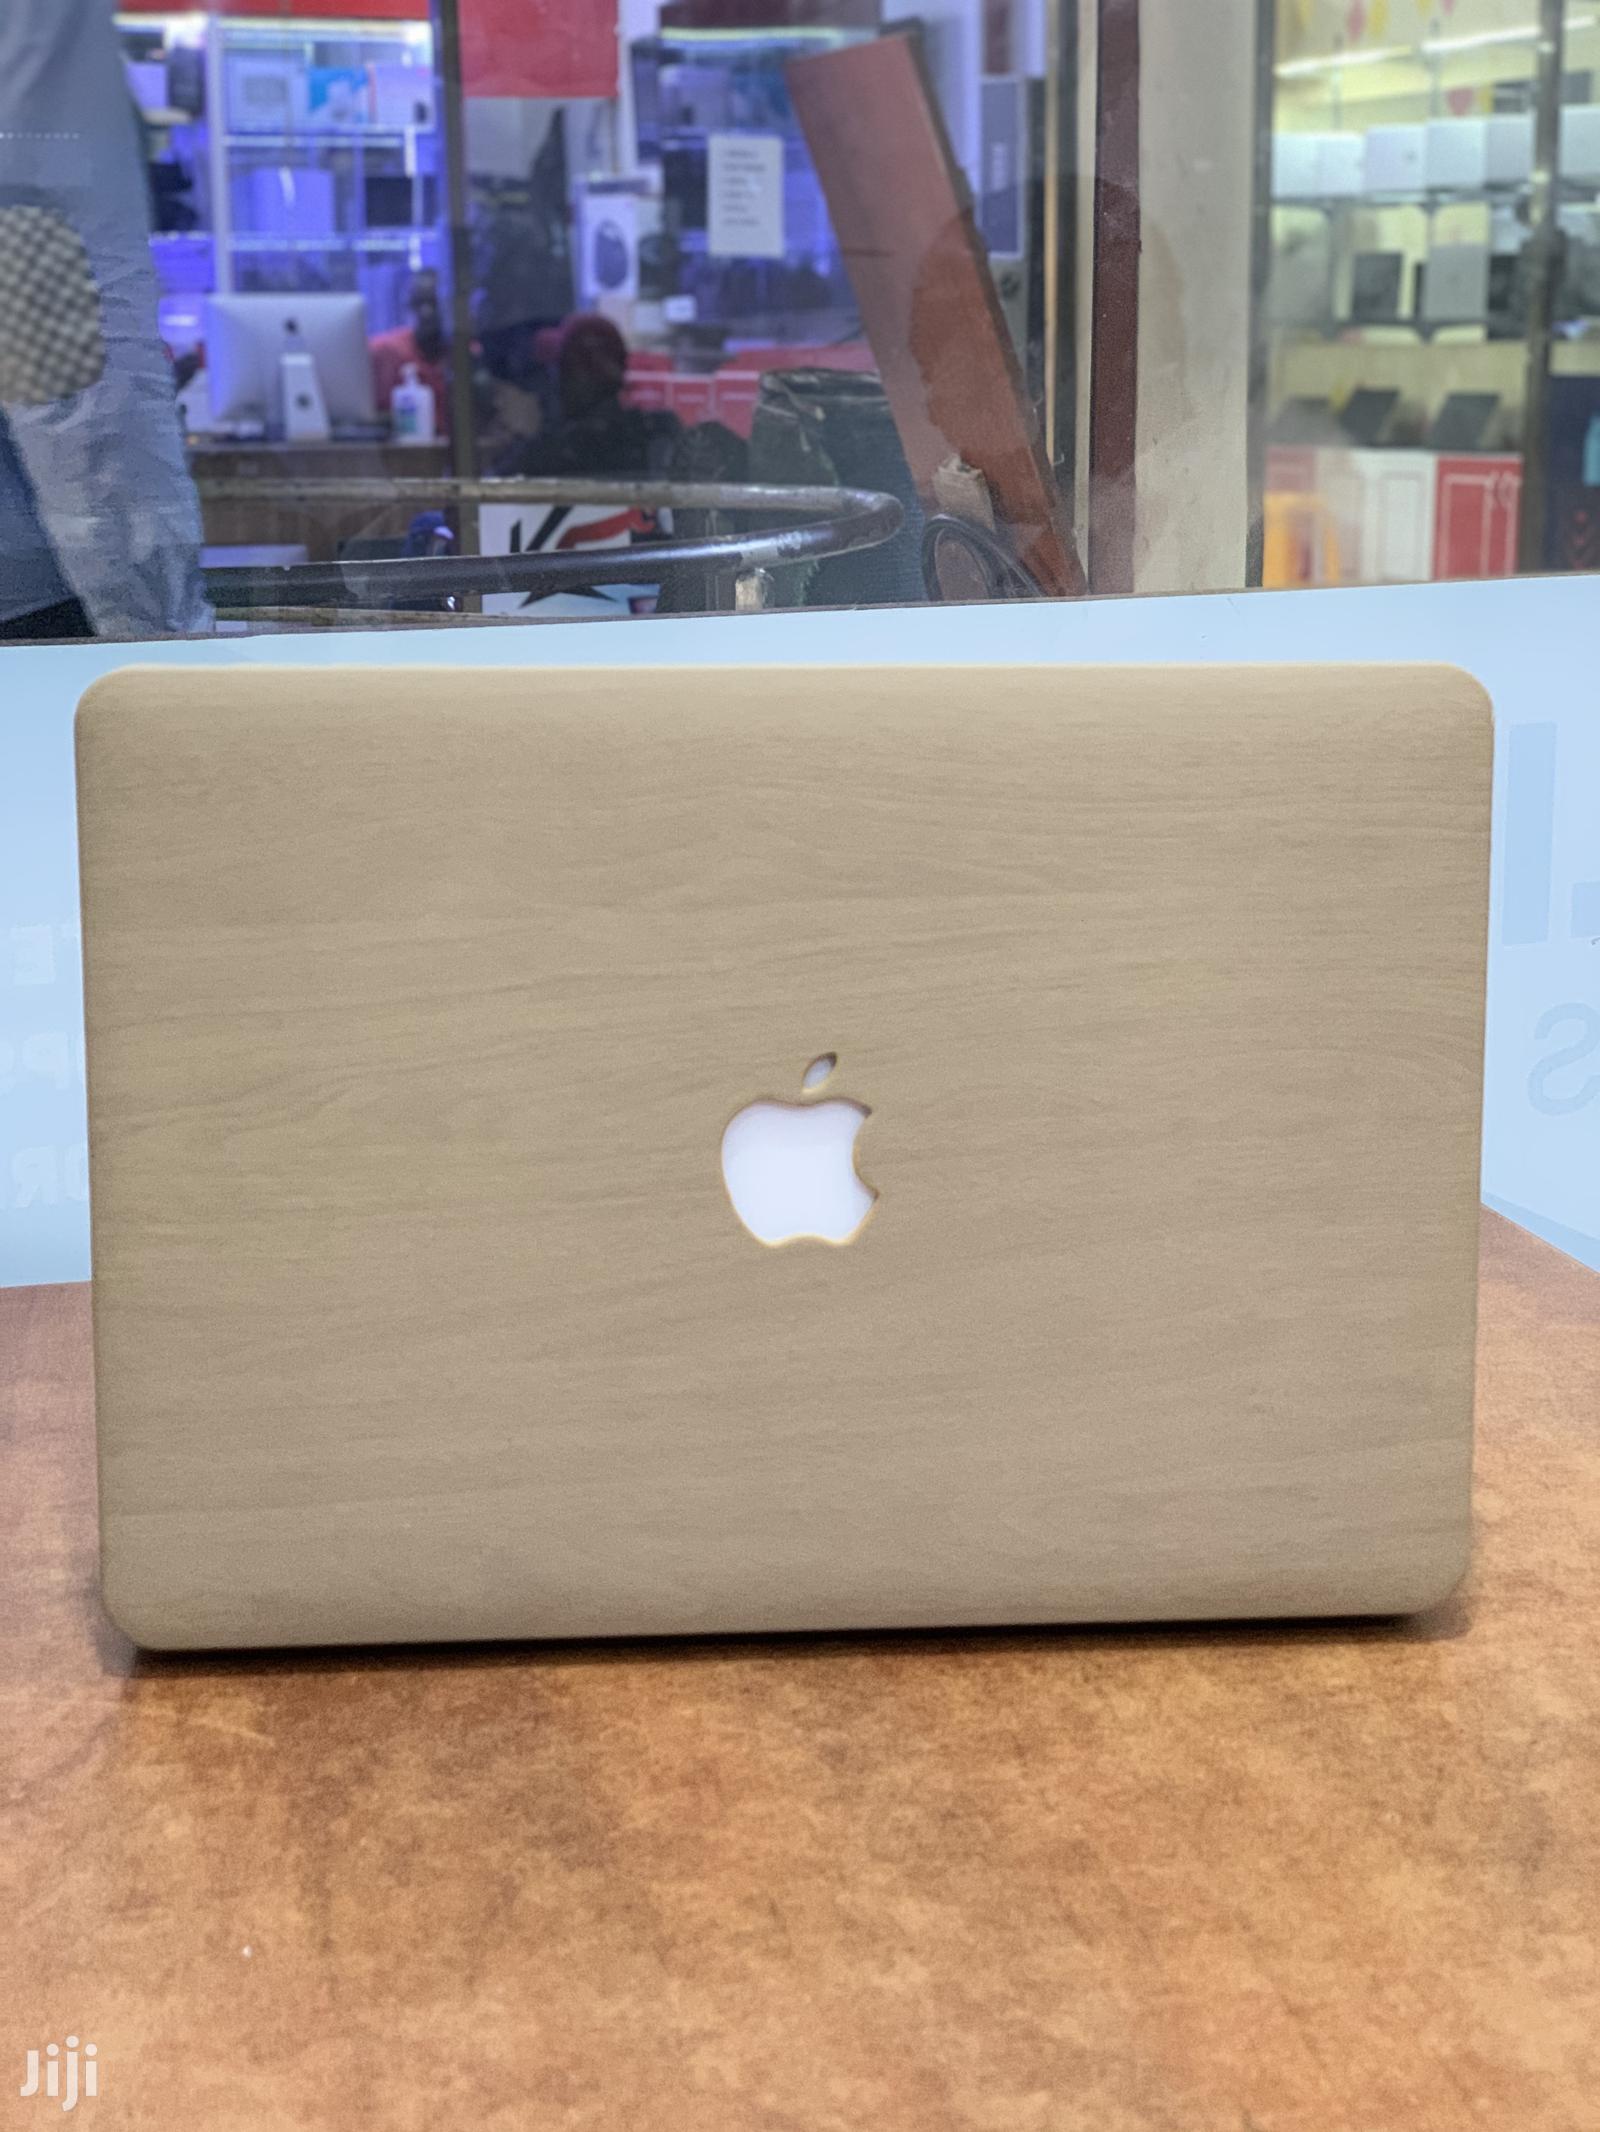 Laptop Apple MacBook Air 8GB Intel Core I7 SSHD (Hybrid) 256GB | Laptops & Computers for sale in Kampala, Central Region, Uganda